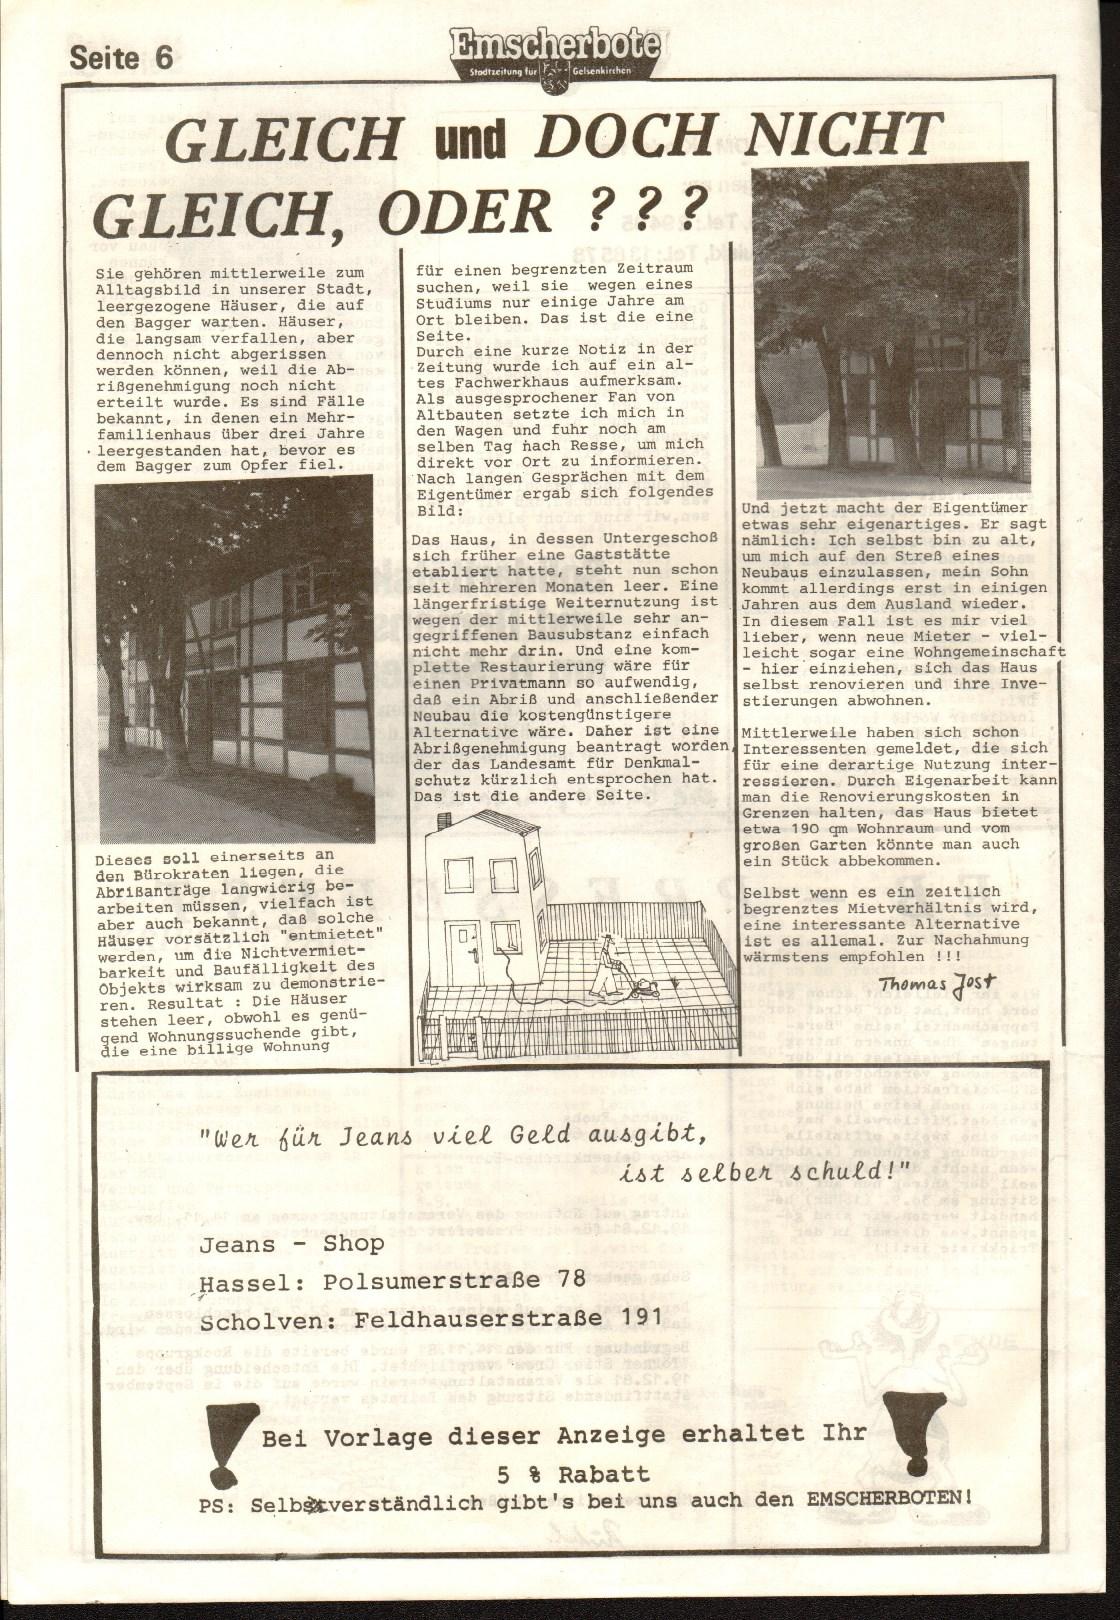 Gelsenkirchen_Emscherbote_1981_10_06